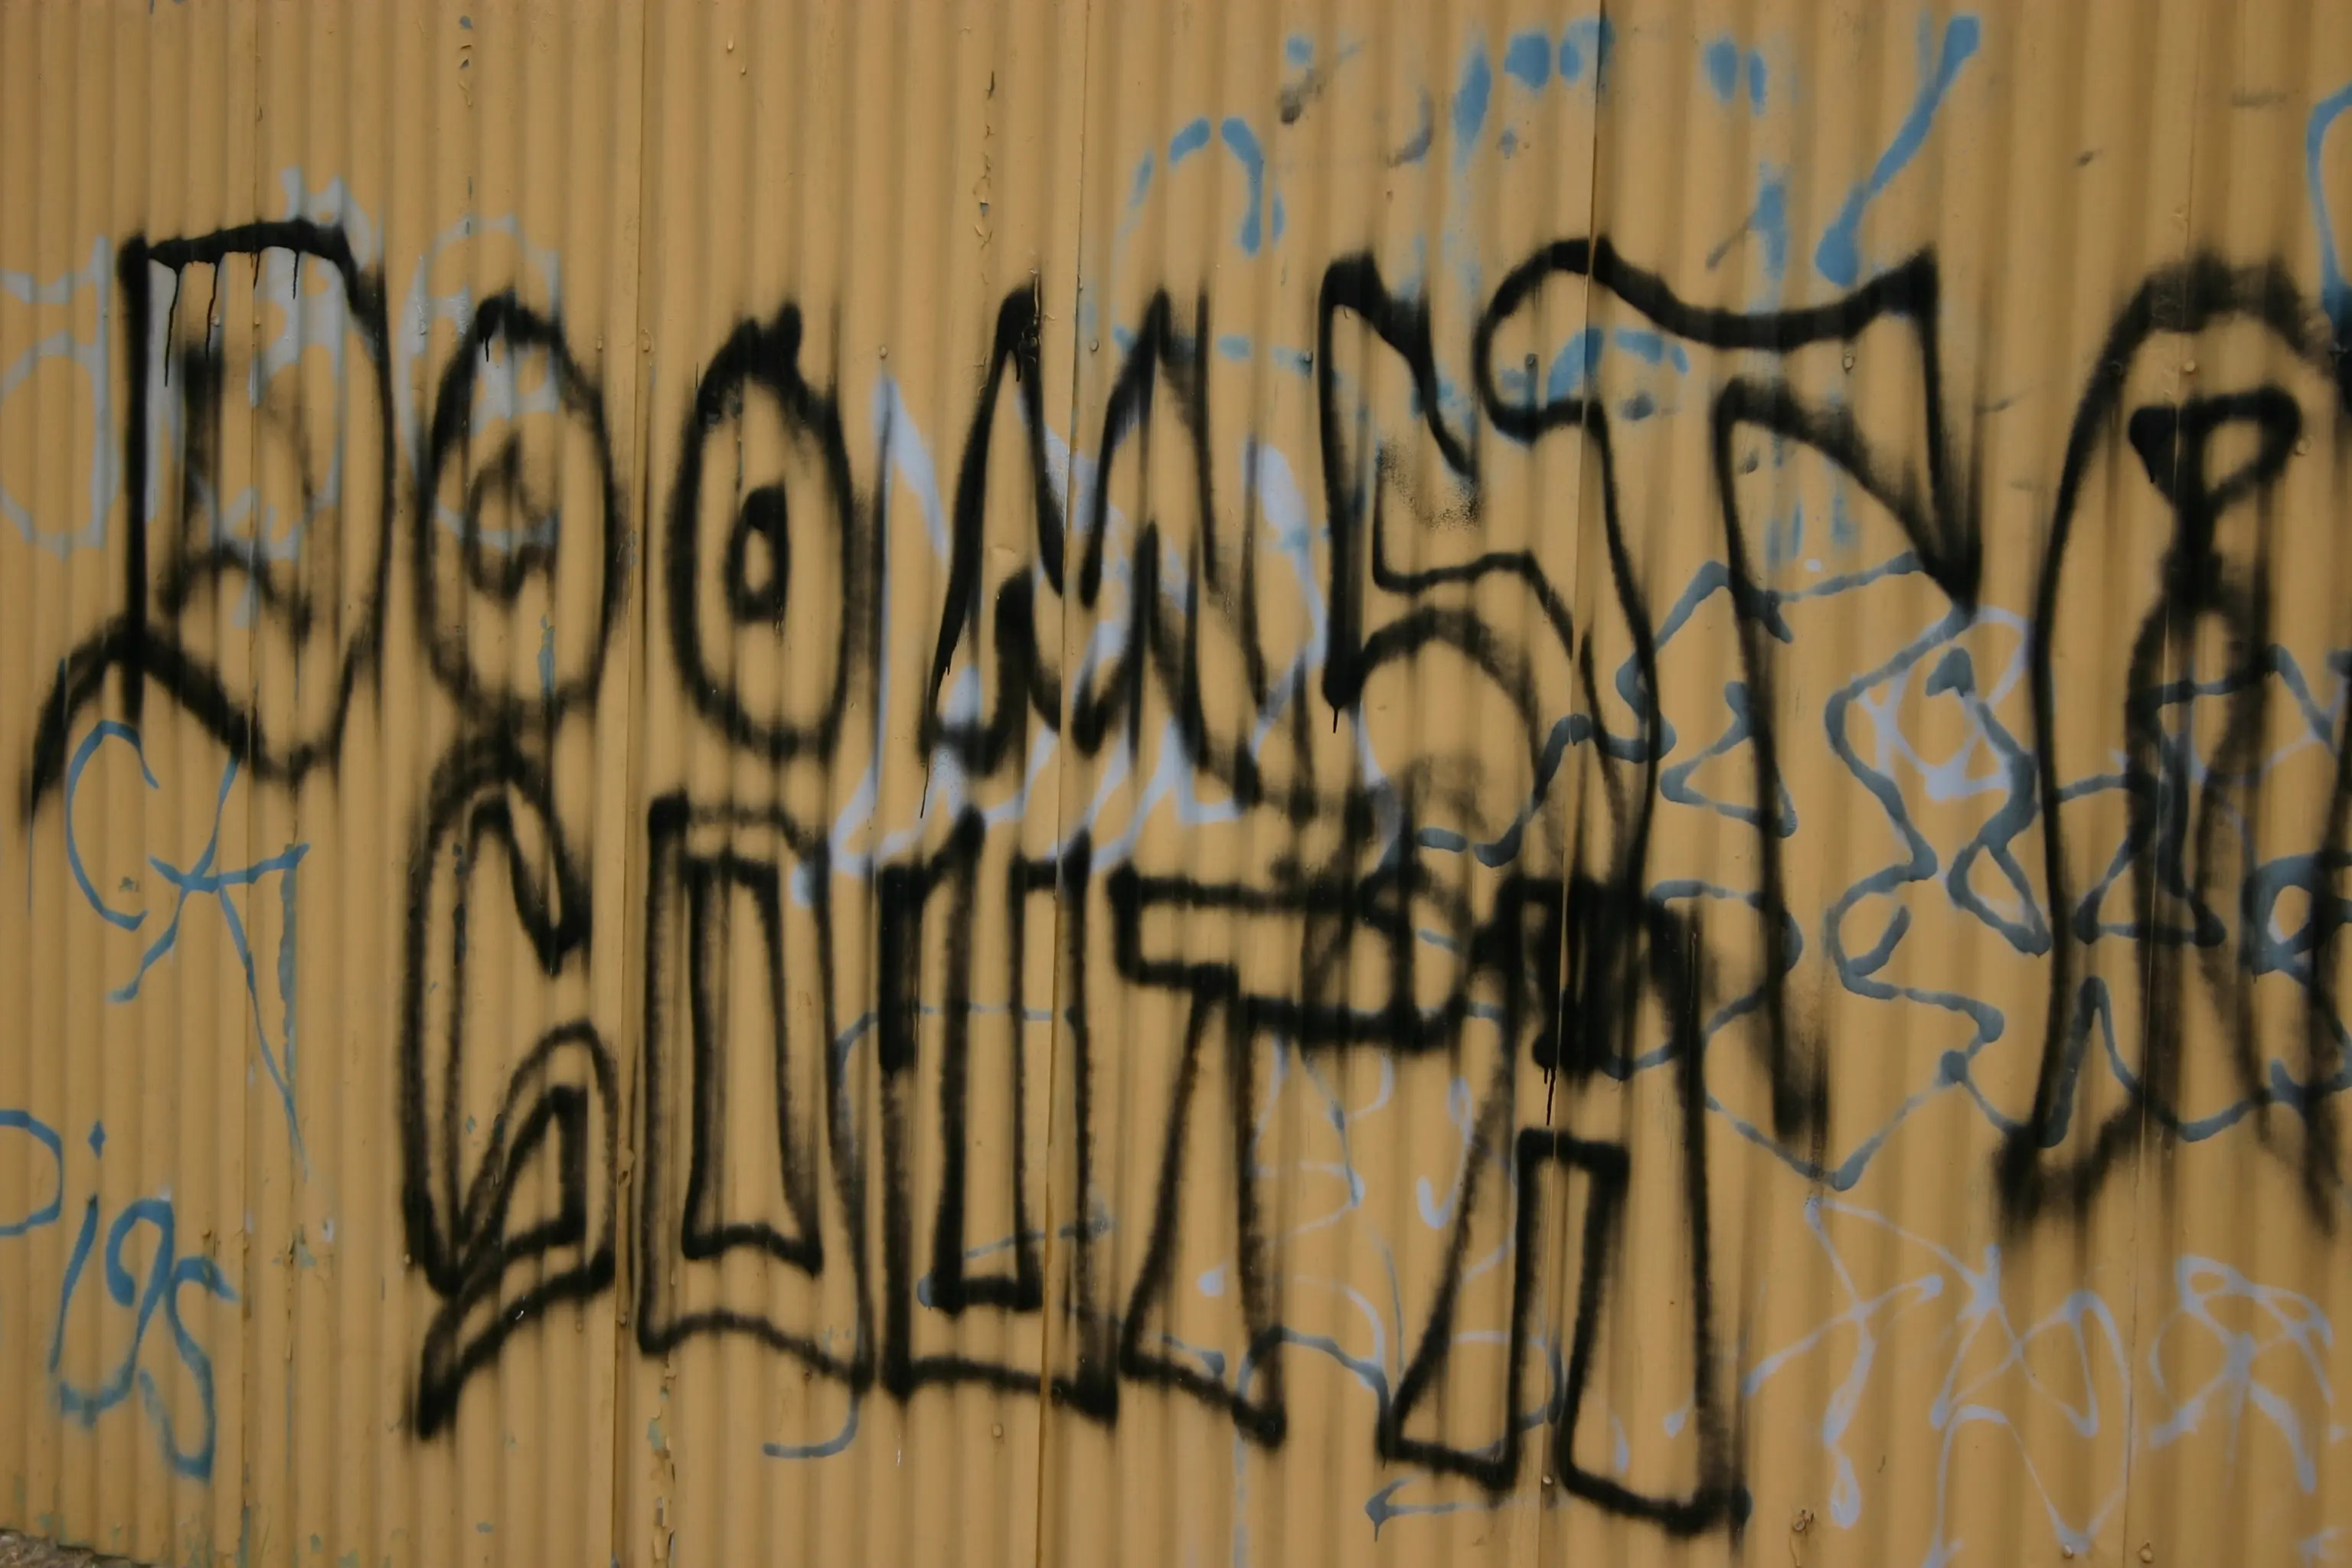 Colorado Gangs On The Decline